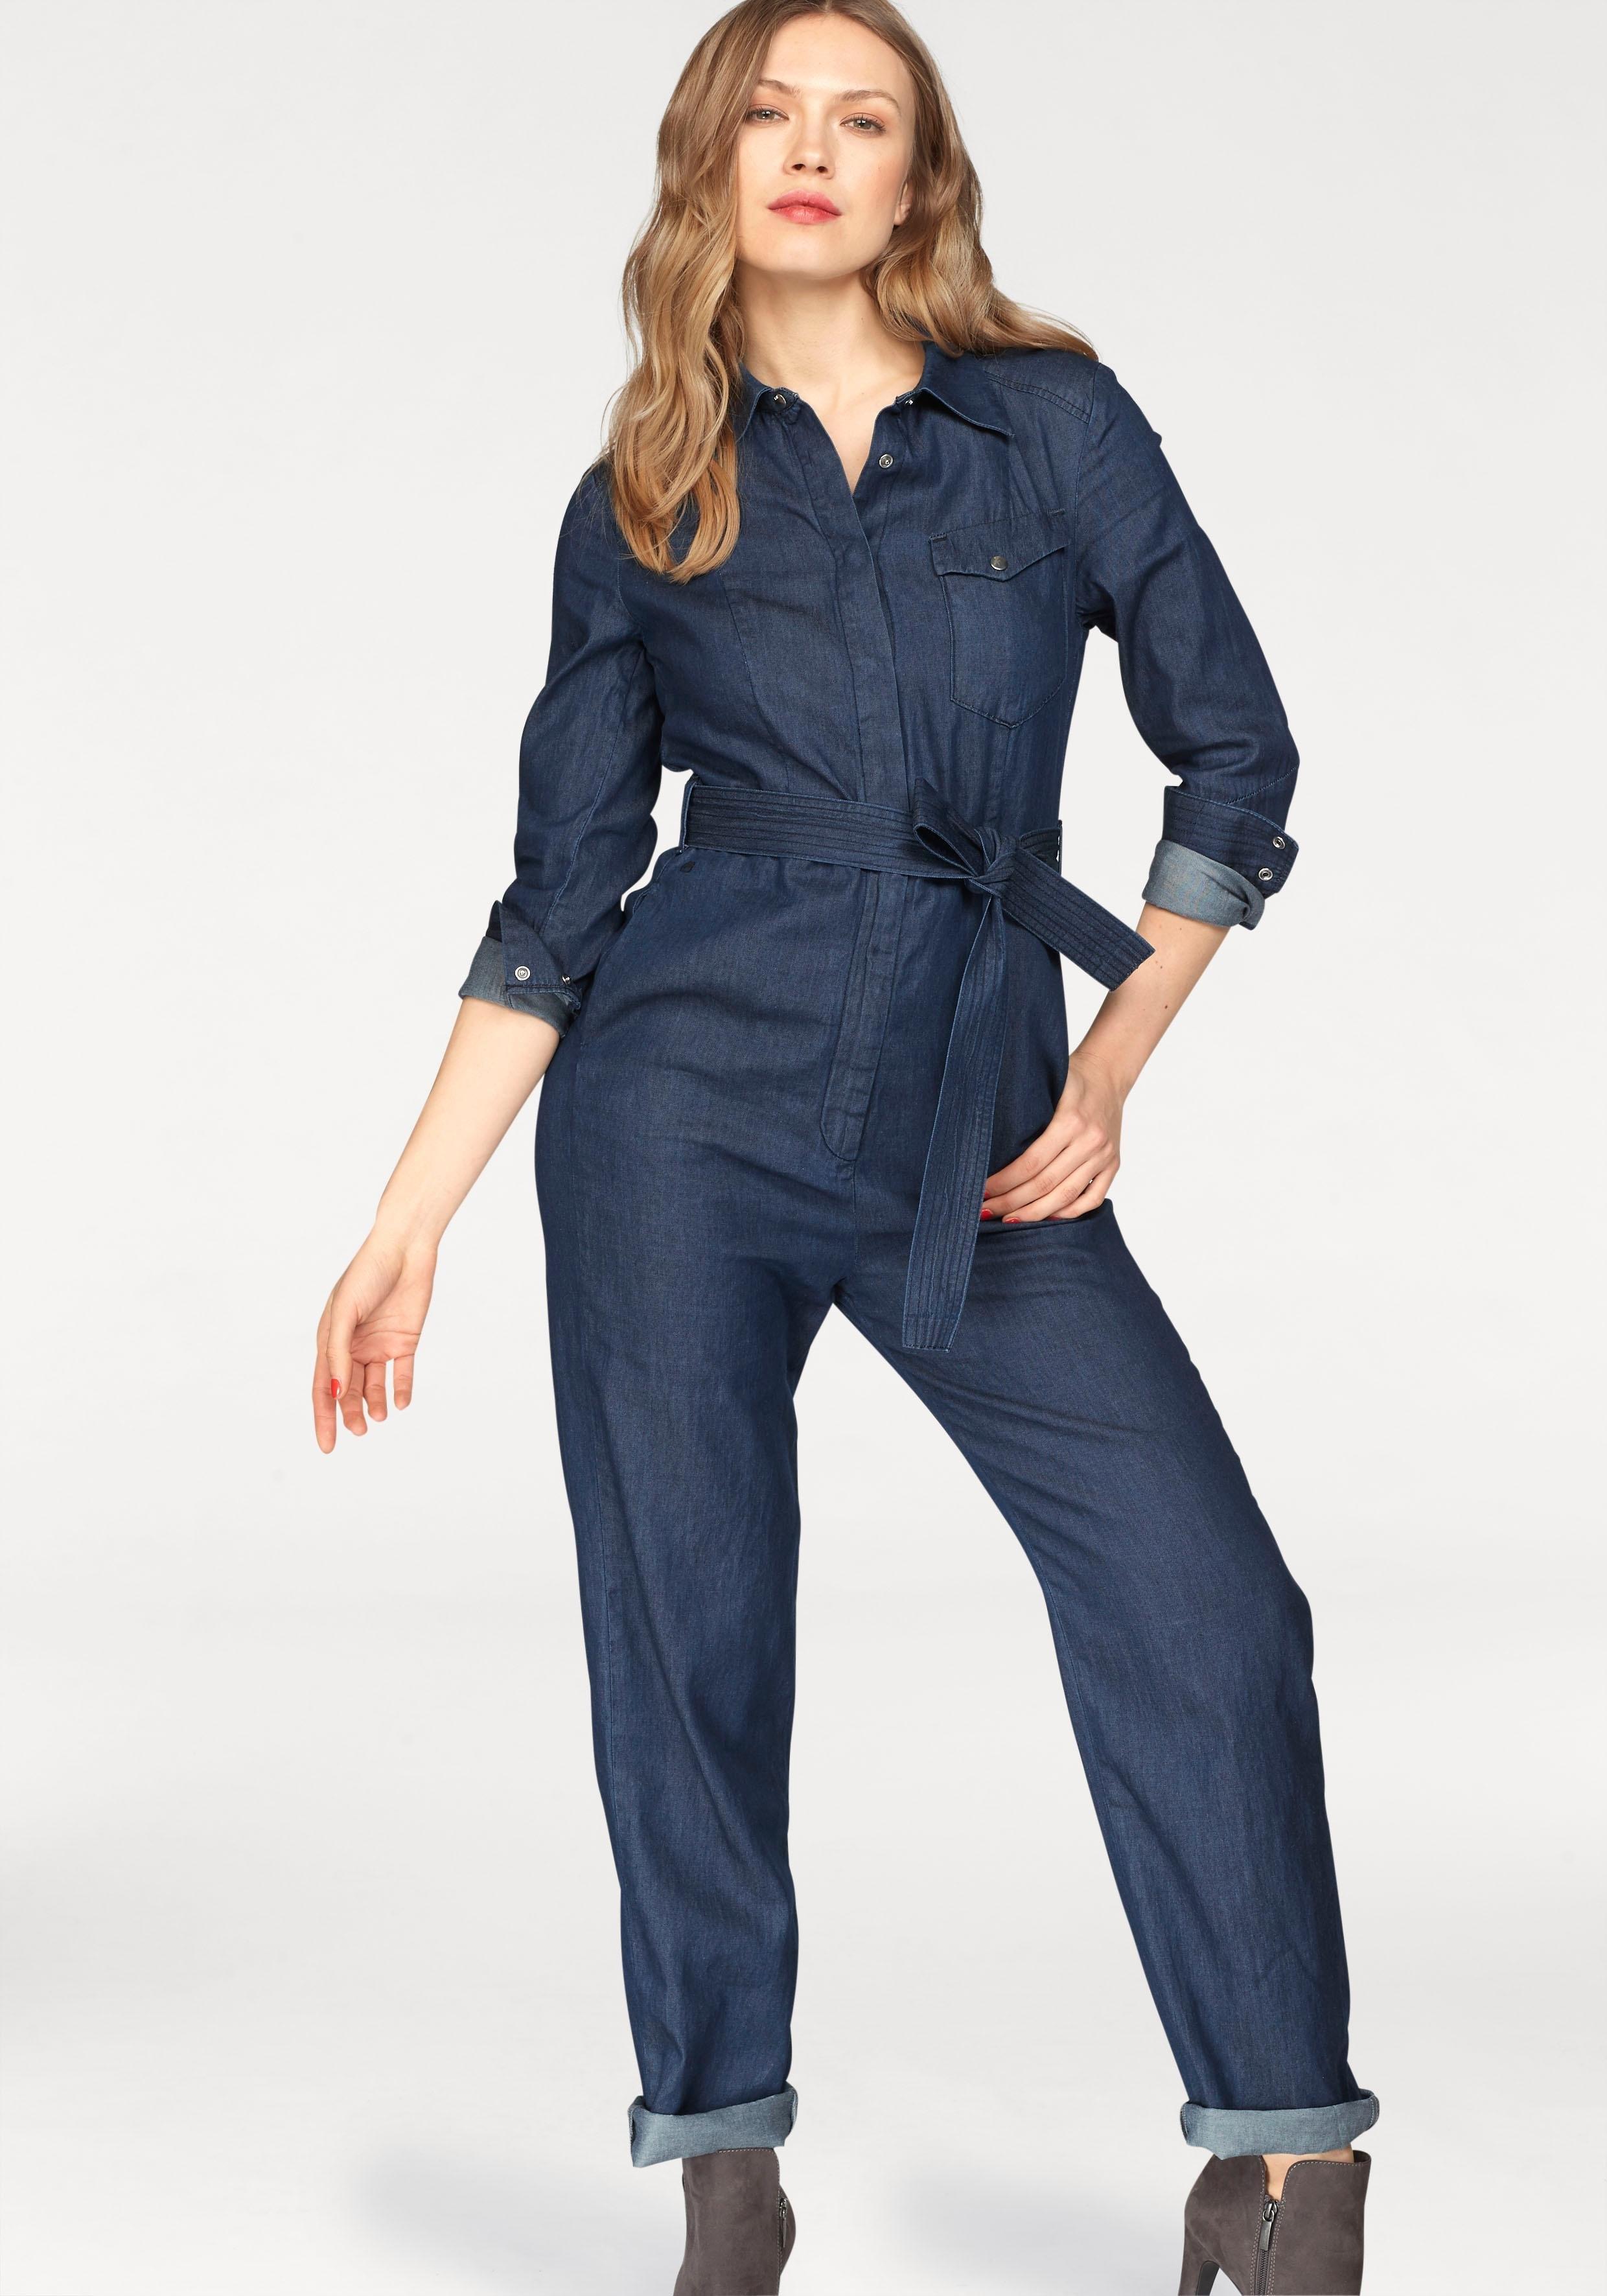 G-star Raw jumpsuit »Tacoma Jumpsuit« goedkoop op otto.nl kopen